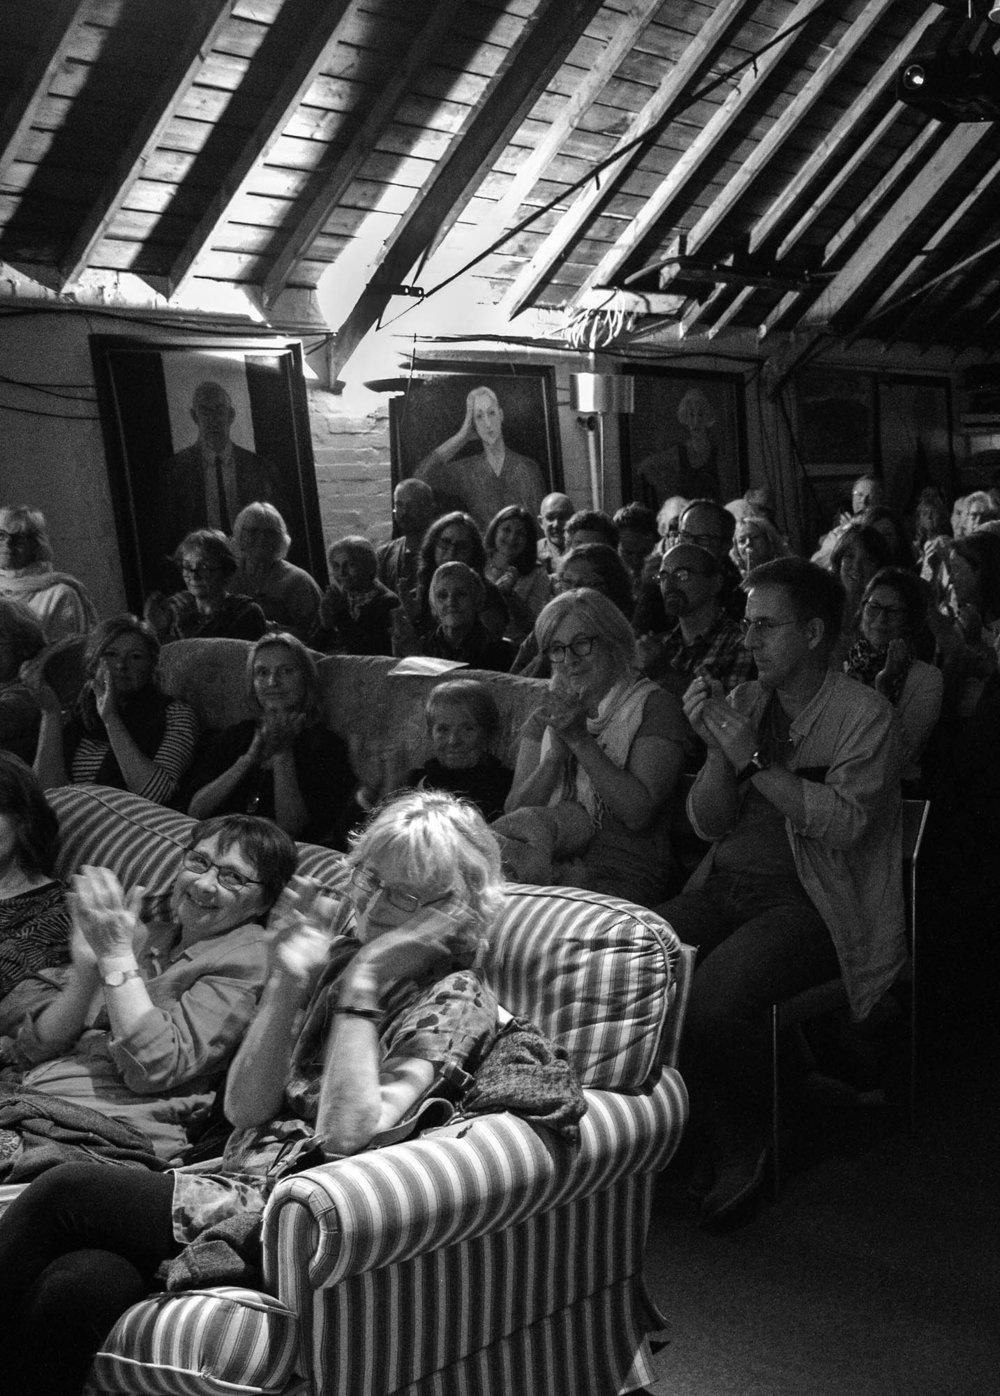 Audience at an Ebenezer Event